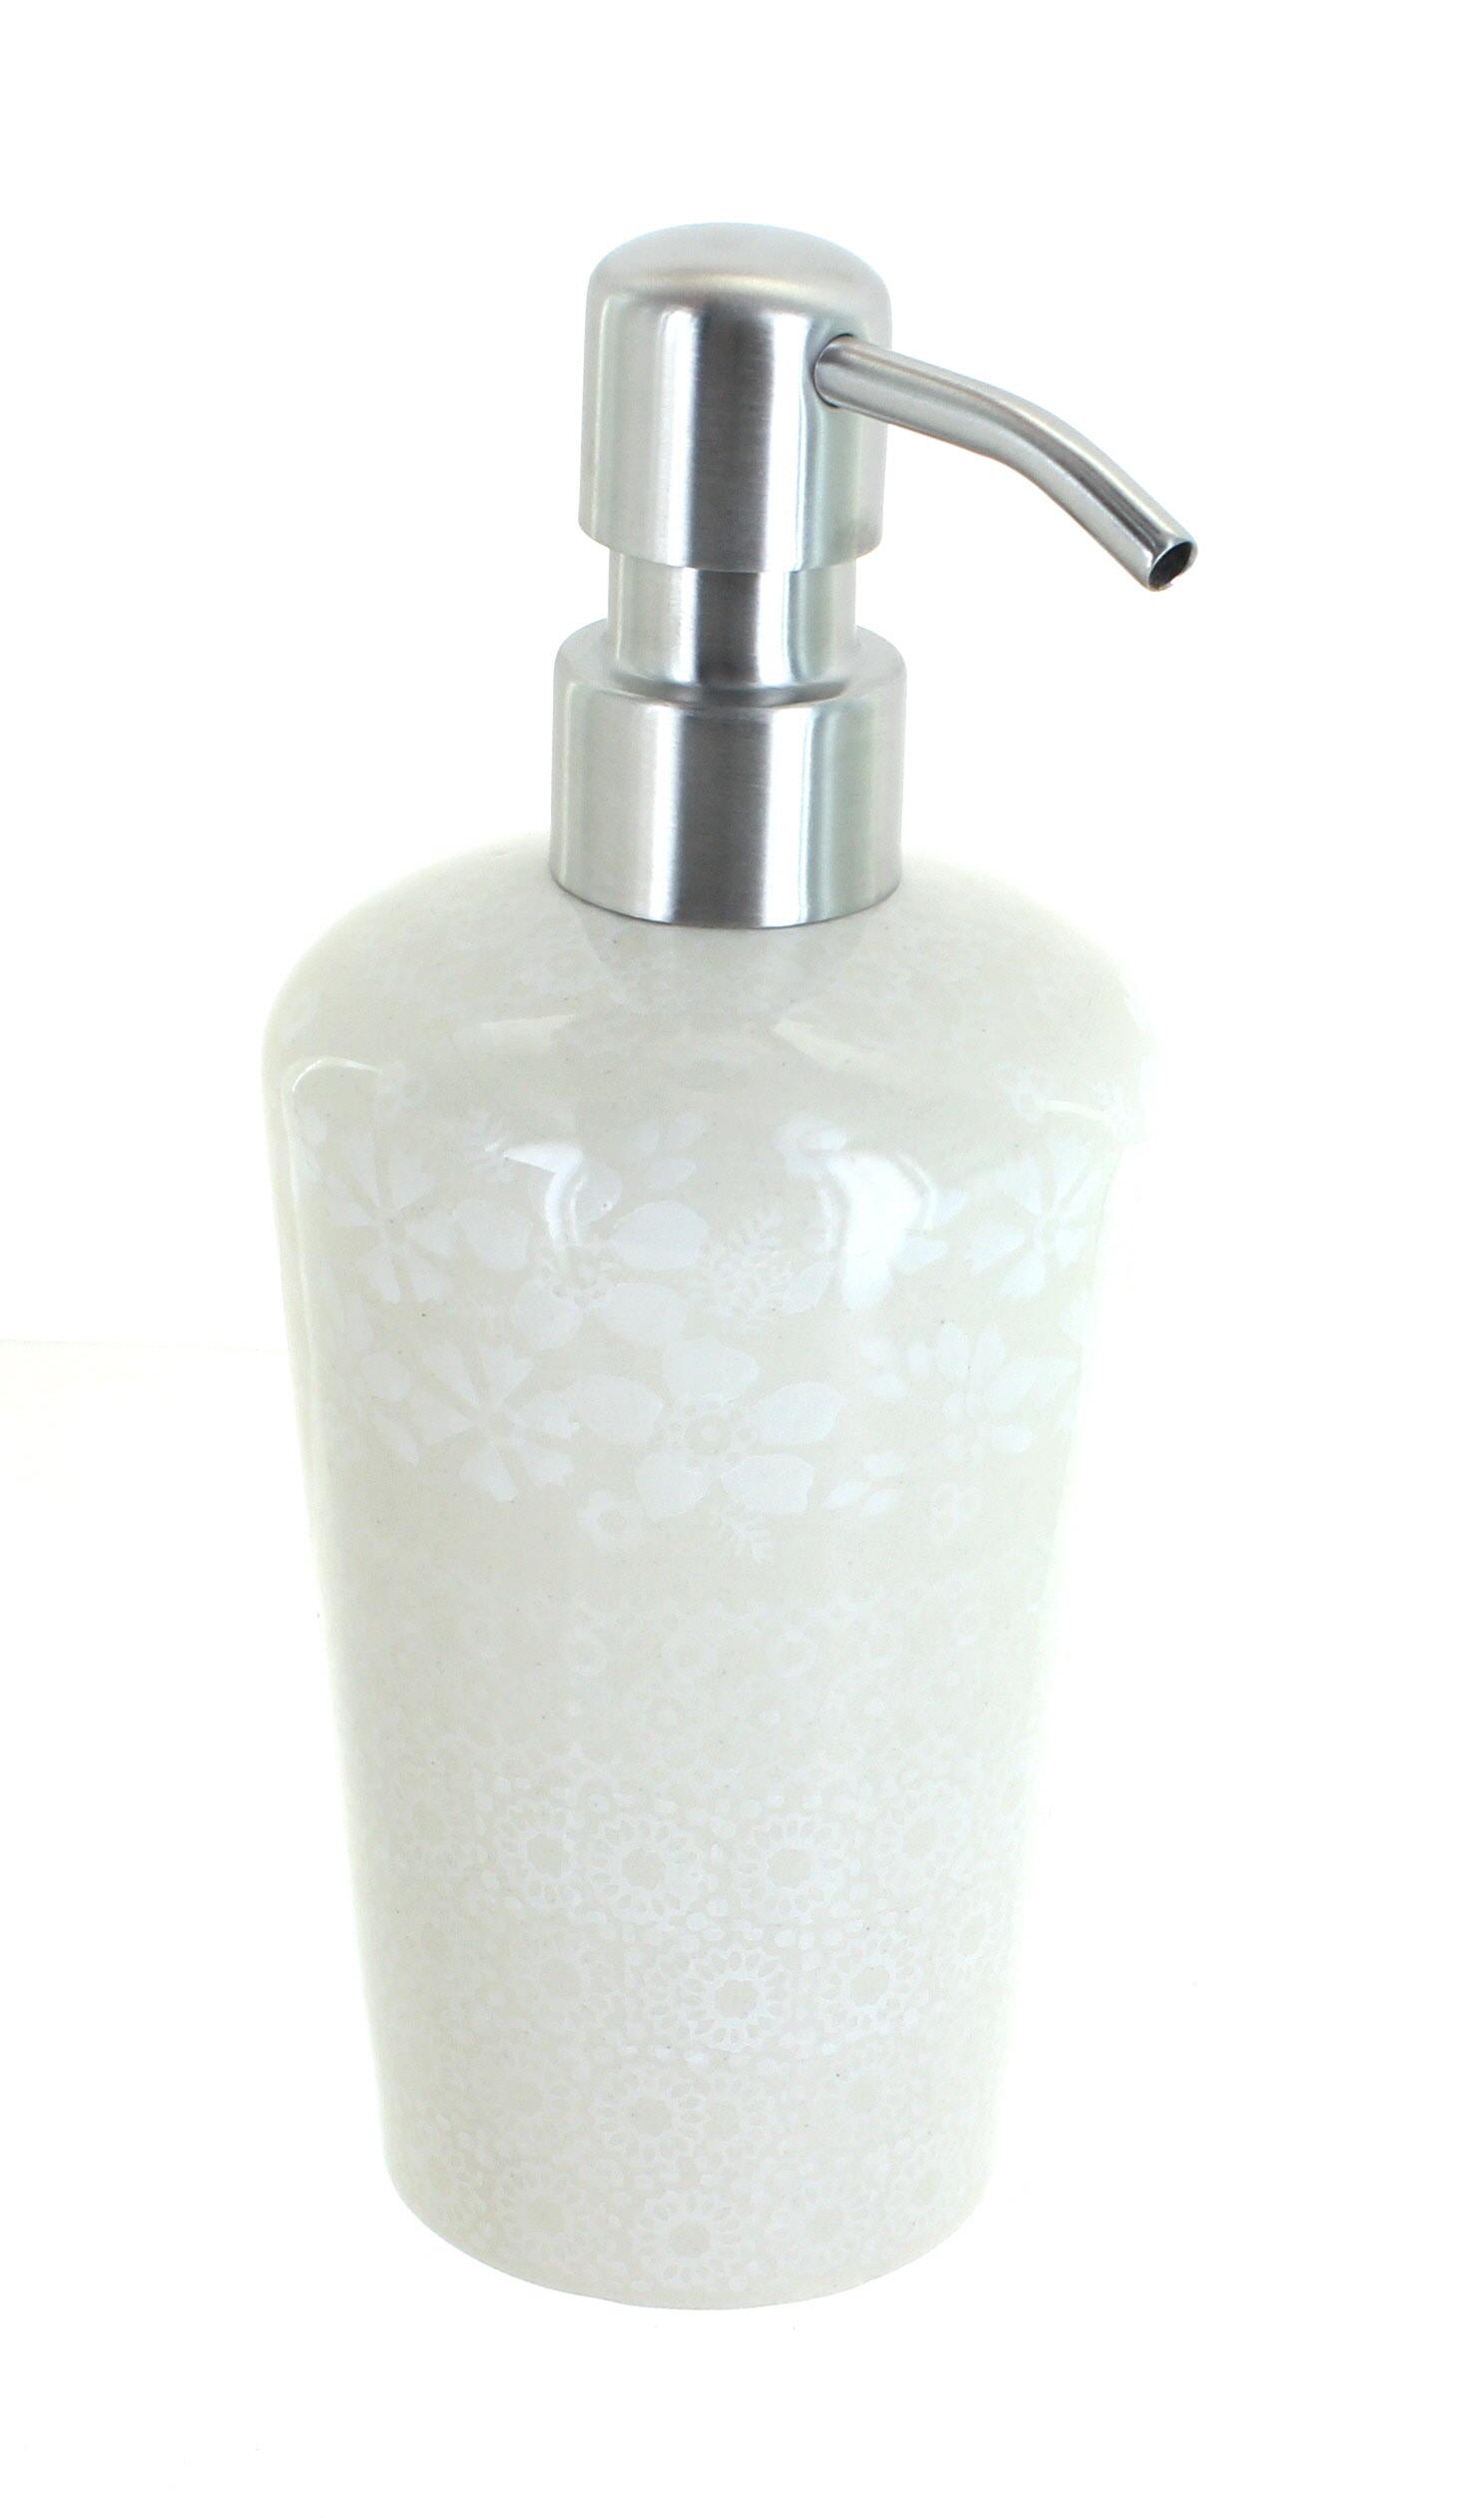 NEW KASSATEX BLUE FLORAL,WHITE CERAMIC CHROME,SILVER TONE PUMP SOAP DISPENSER